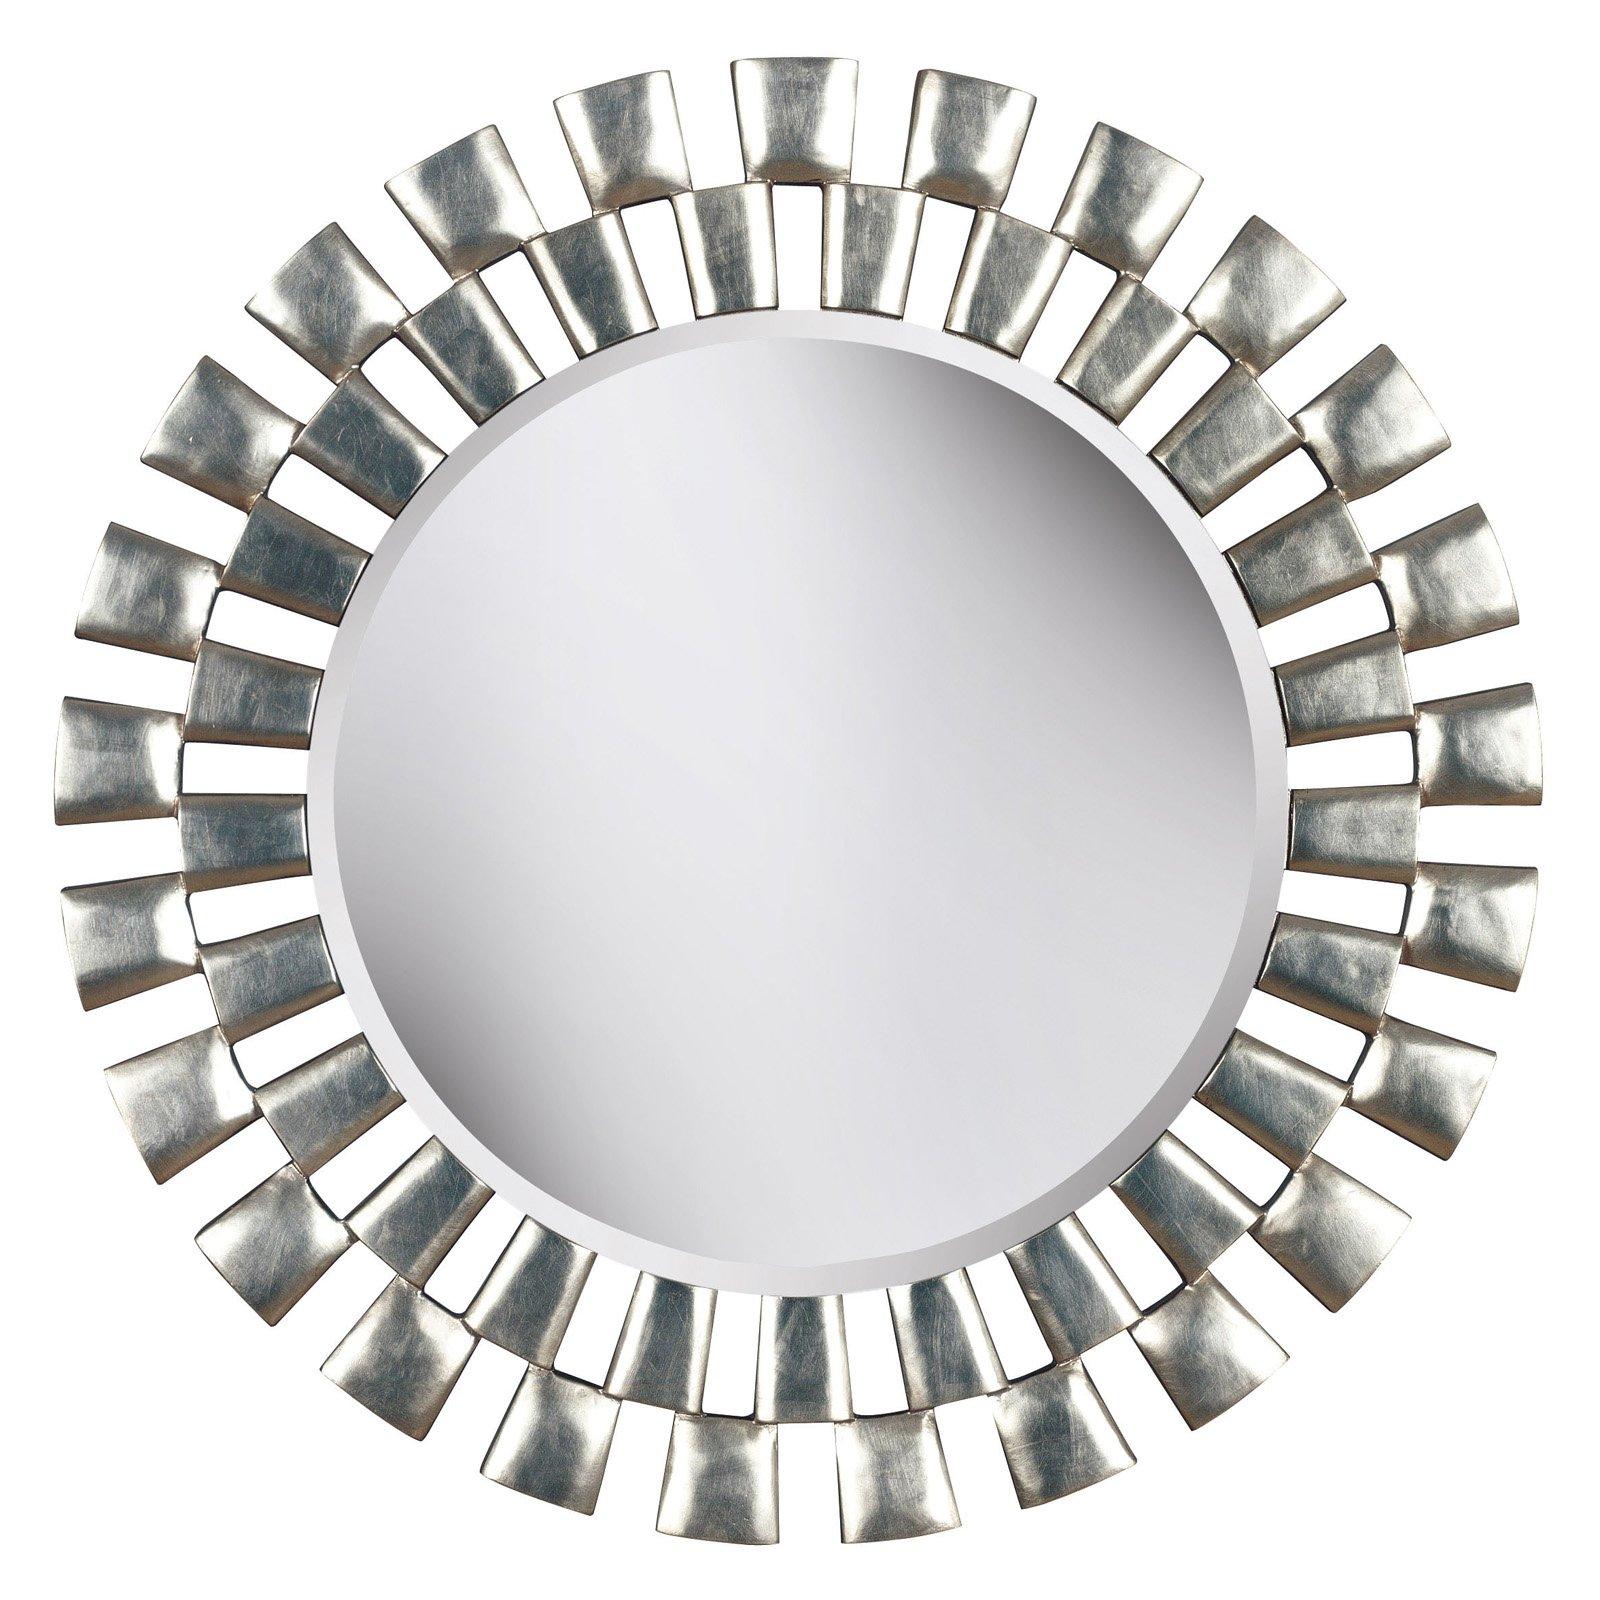 Gilbert Wall Mirror - 24 diam. in.